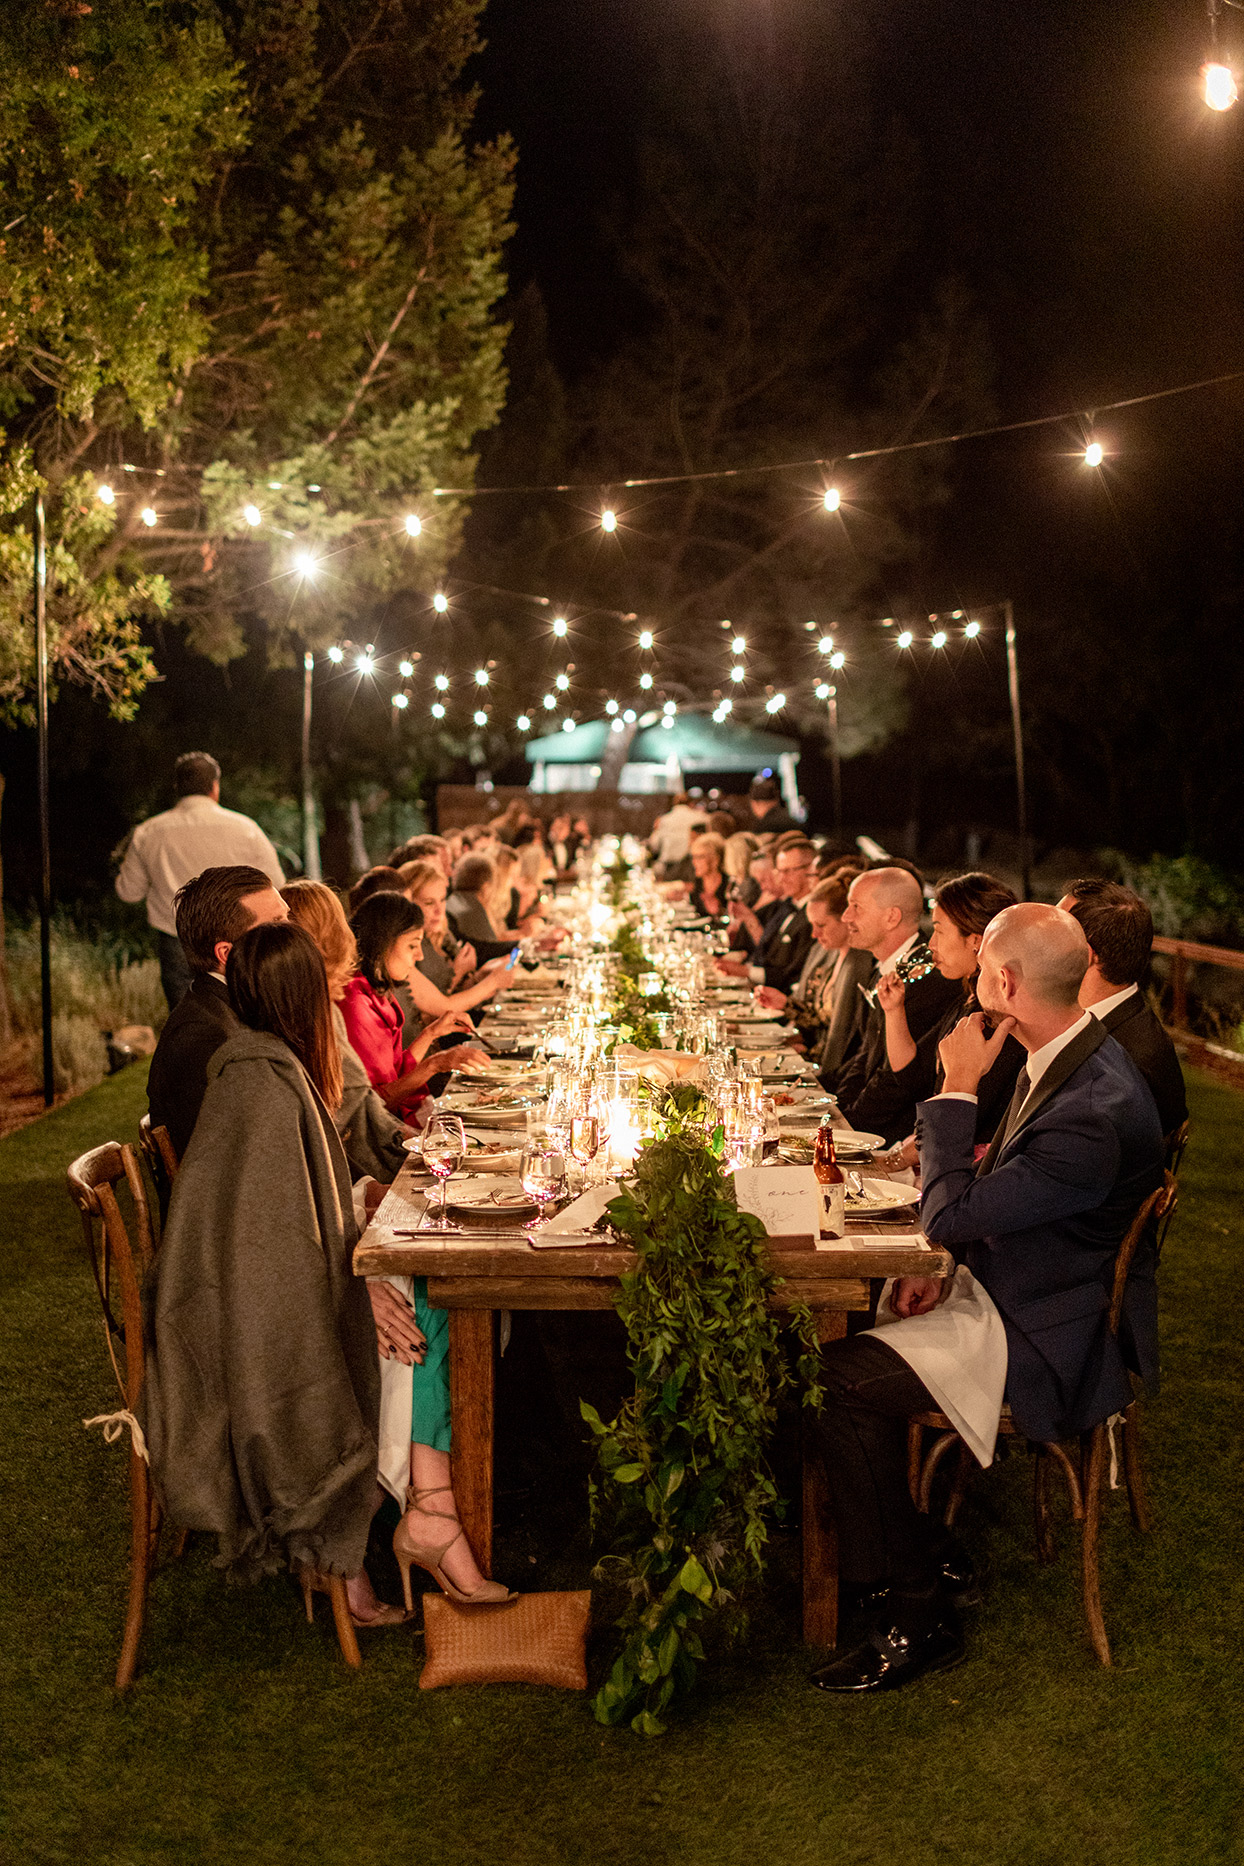 guests eating at evening reception elegant long table under string lights